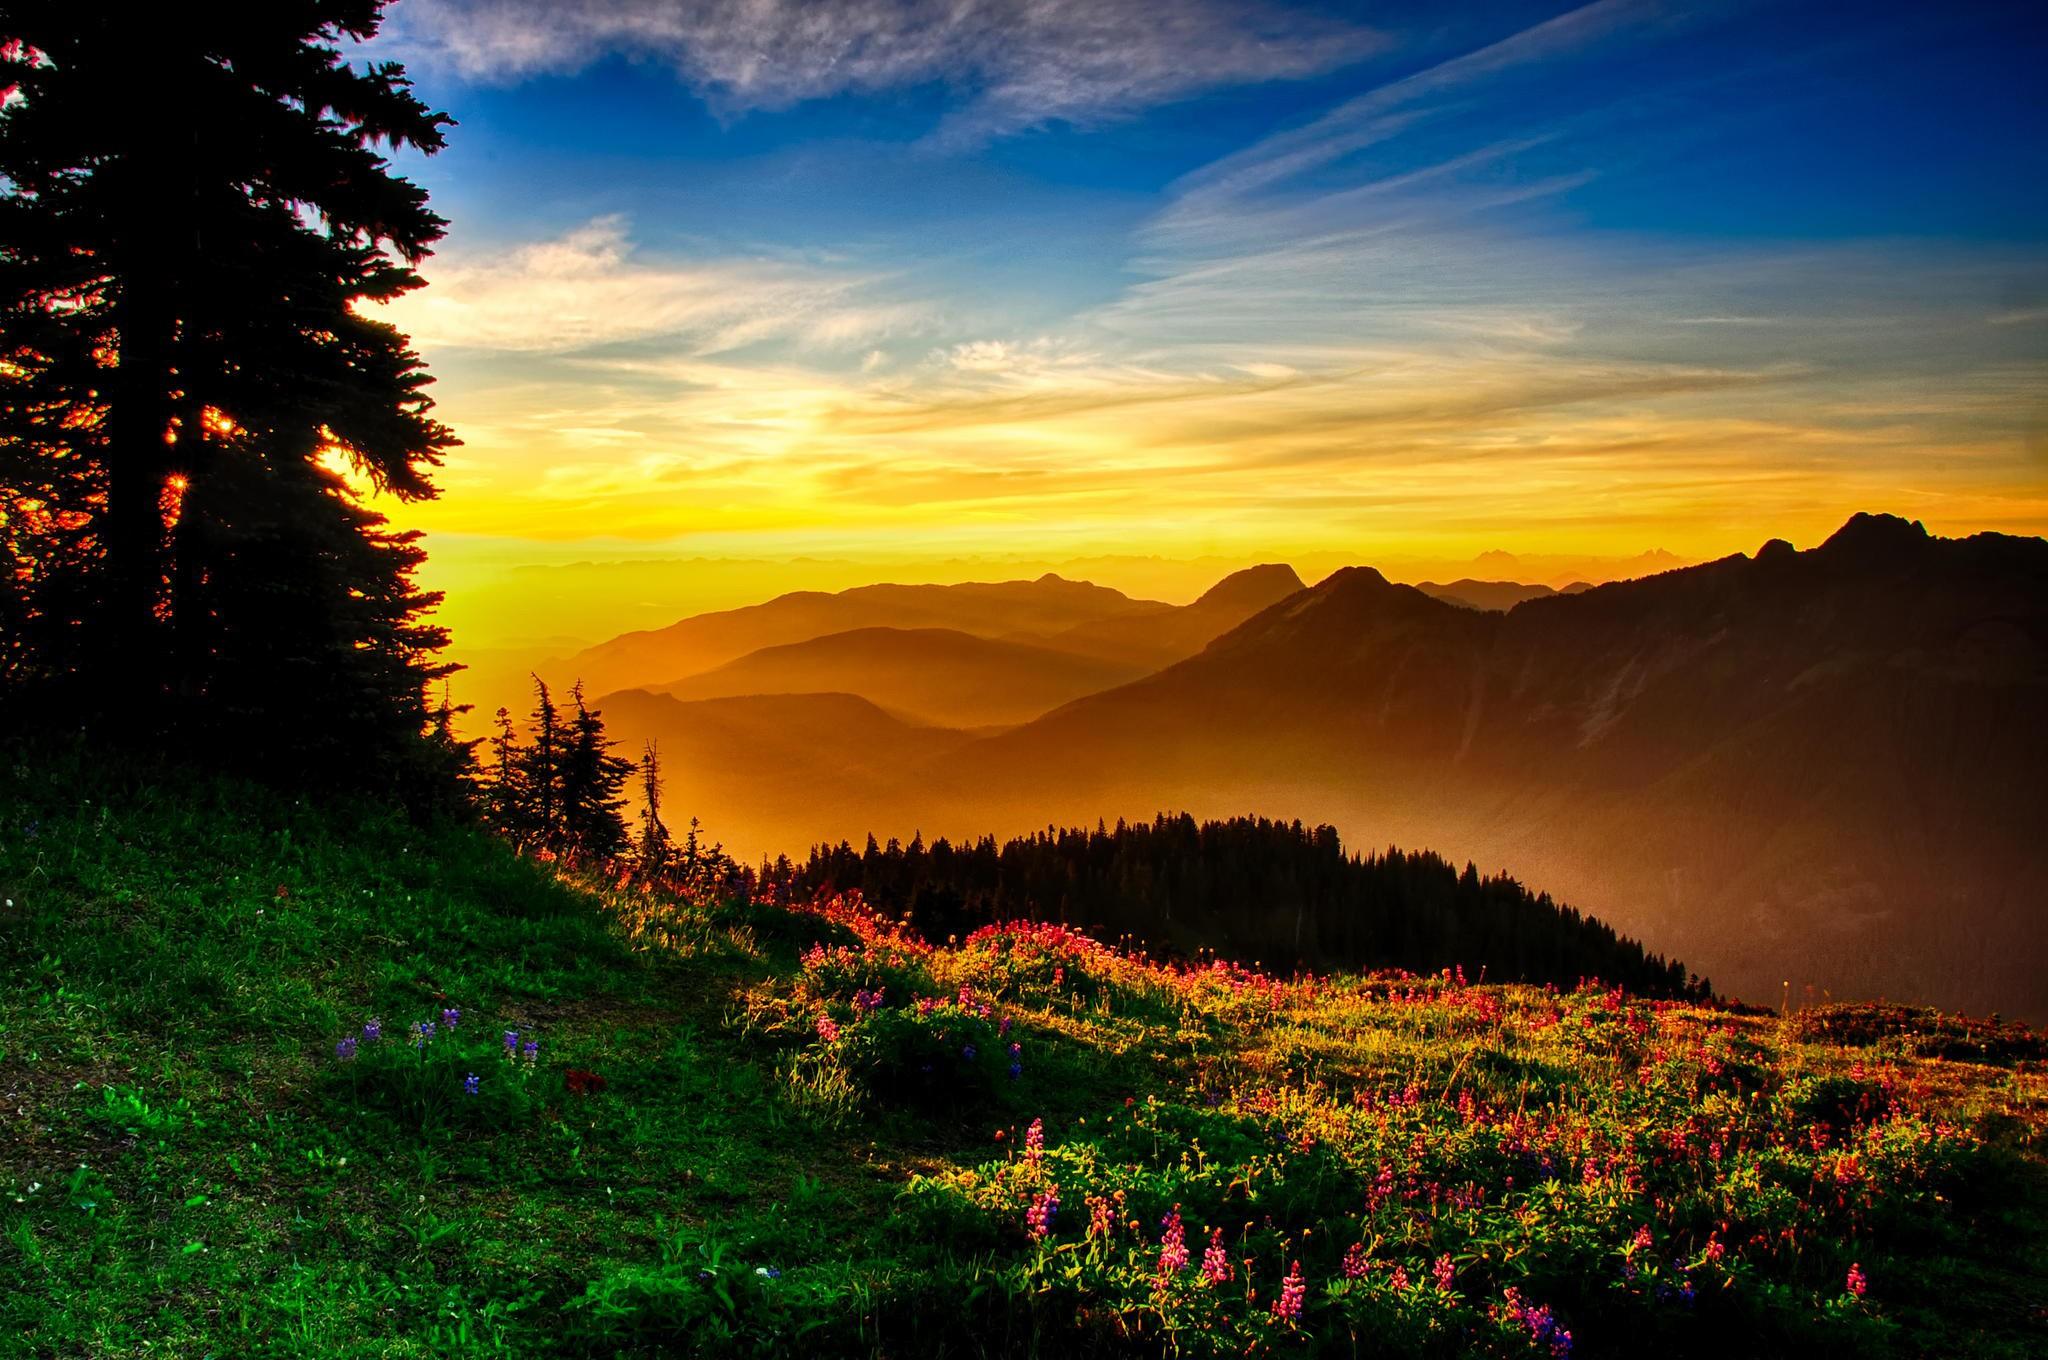 windows 10 wallpaper hd free download,sky,nature,natural landscape,mountainous landforms,sunrise